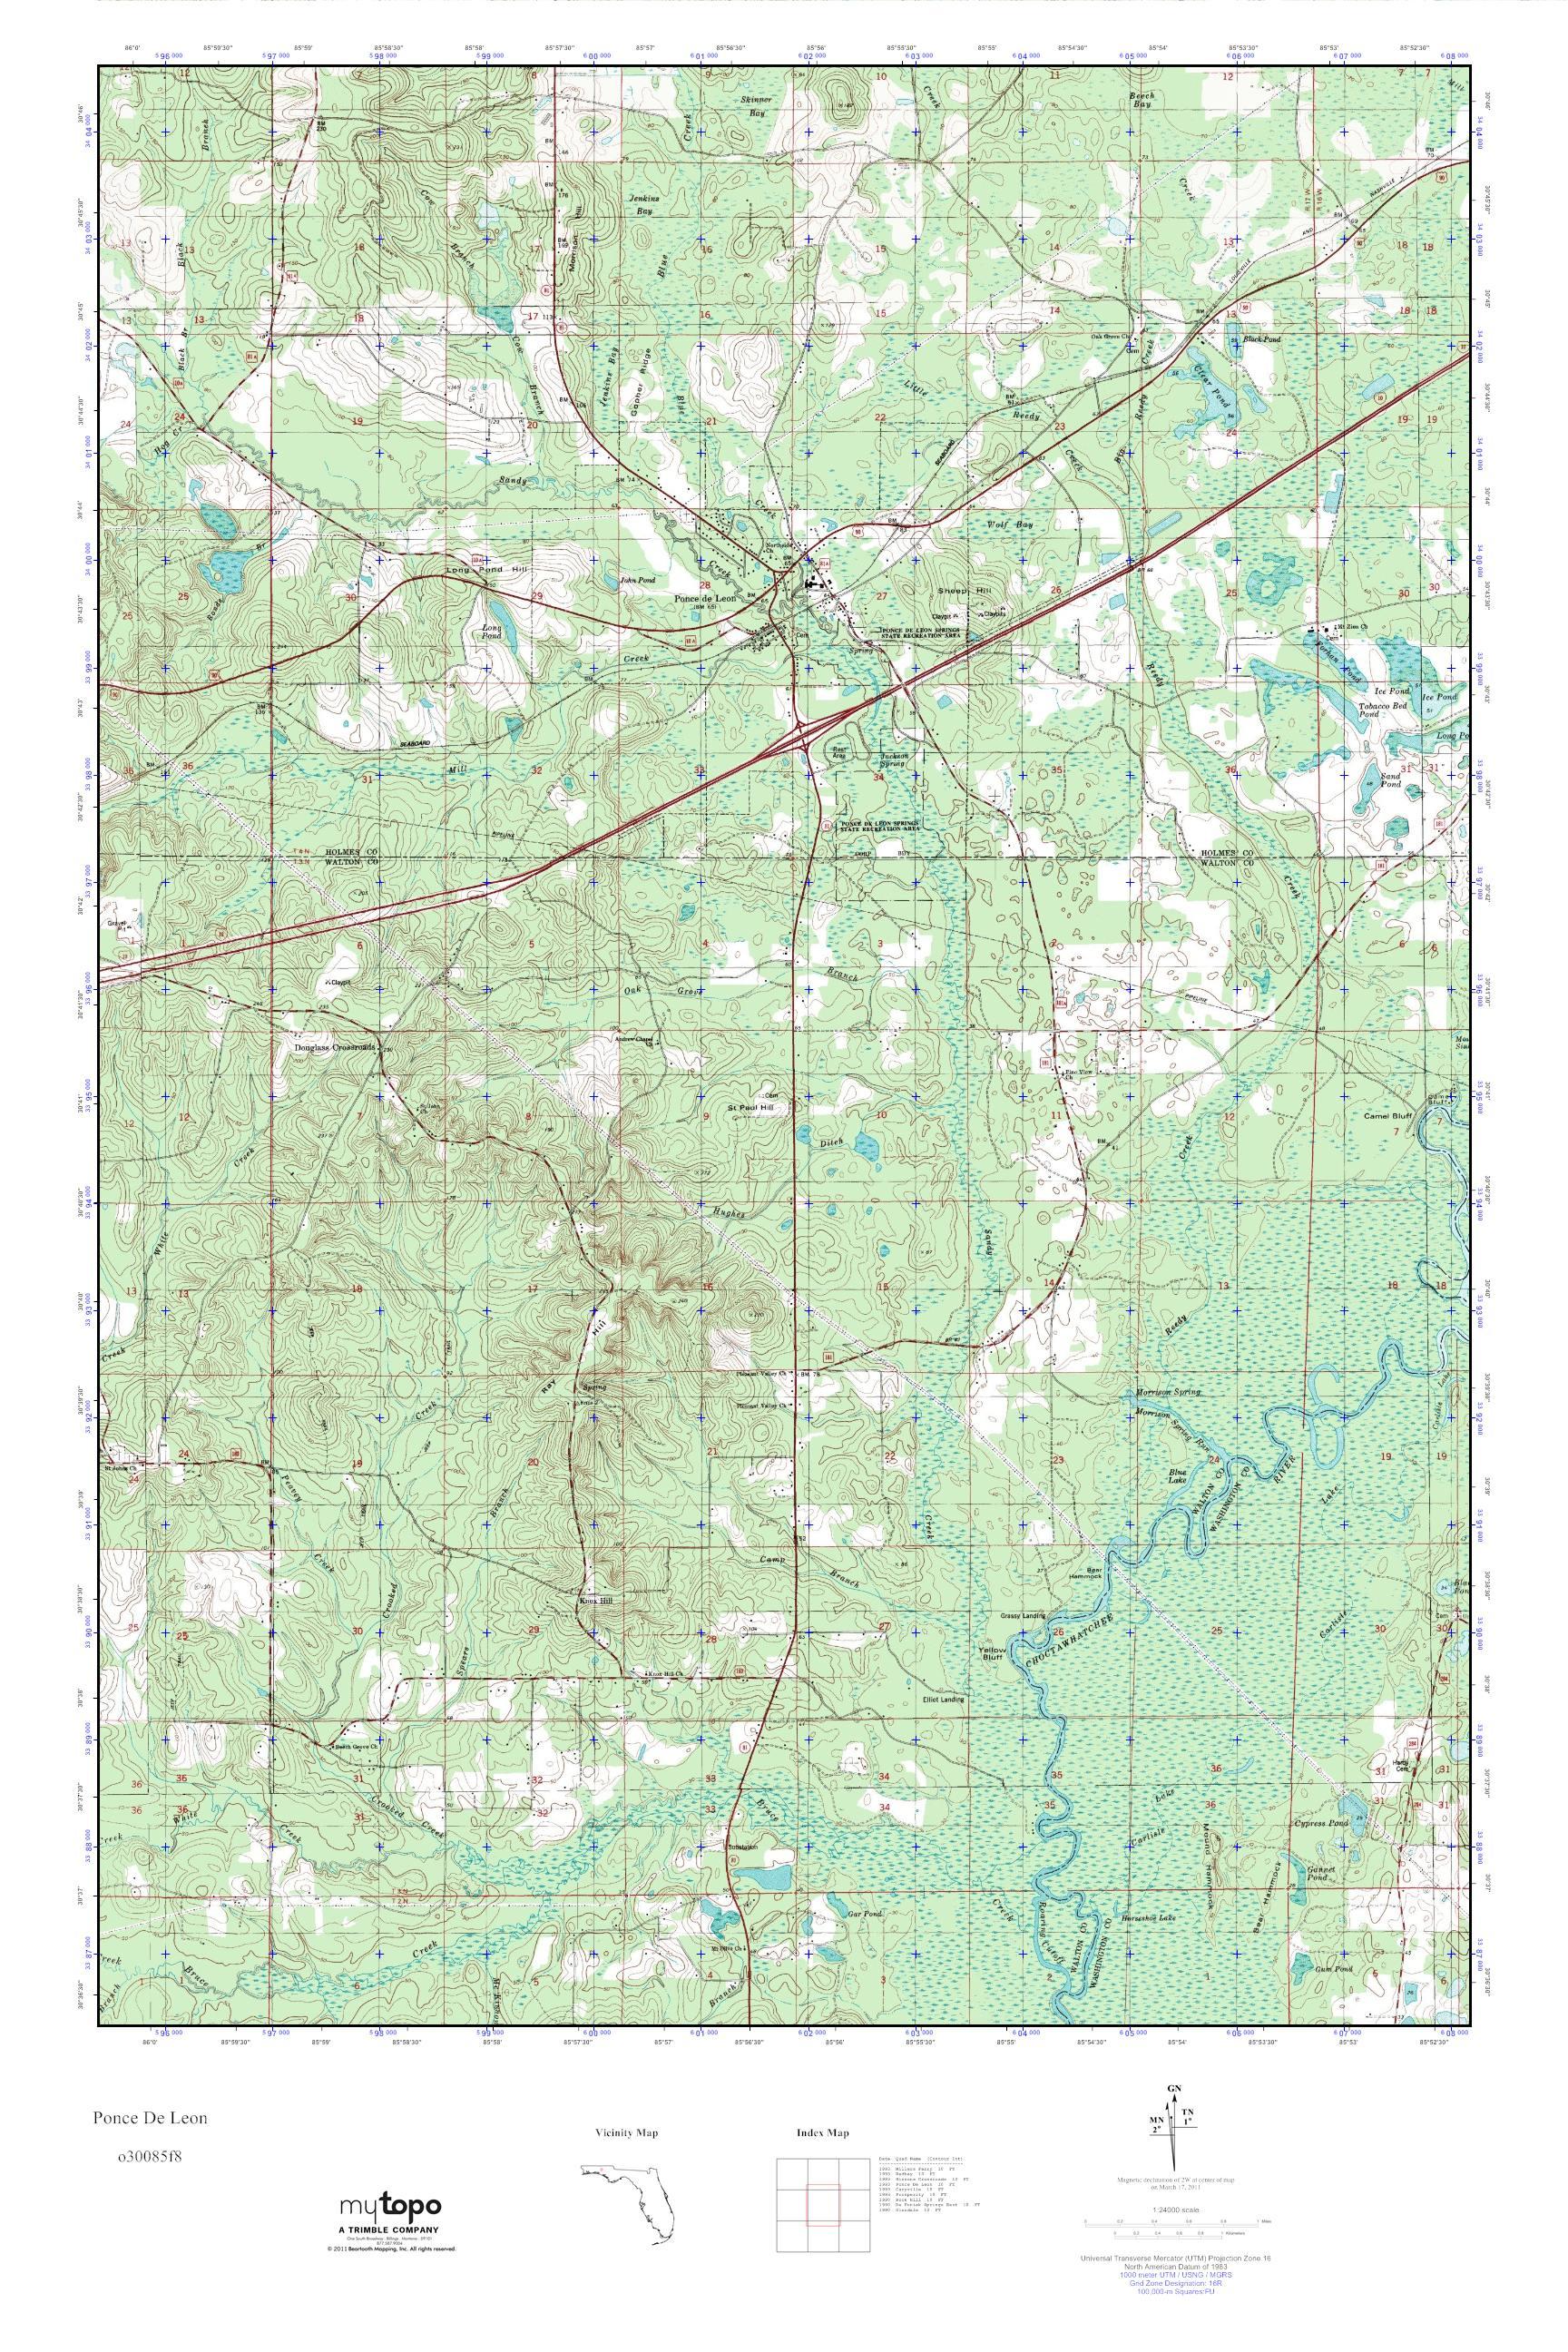 Mytopo Ponce De Leon, Florida Usgs Quad Topo Map - Usgs Topographic Maps Florida